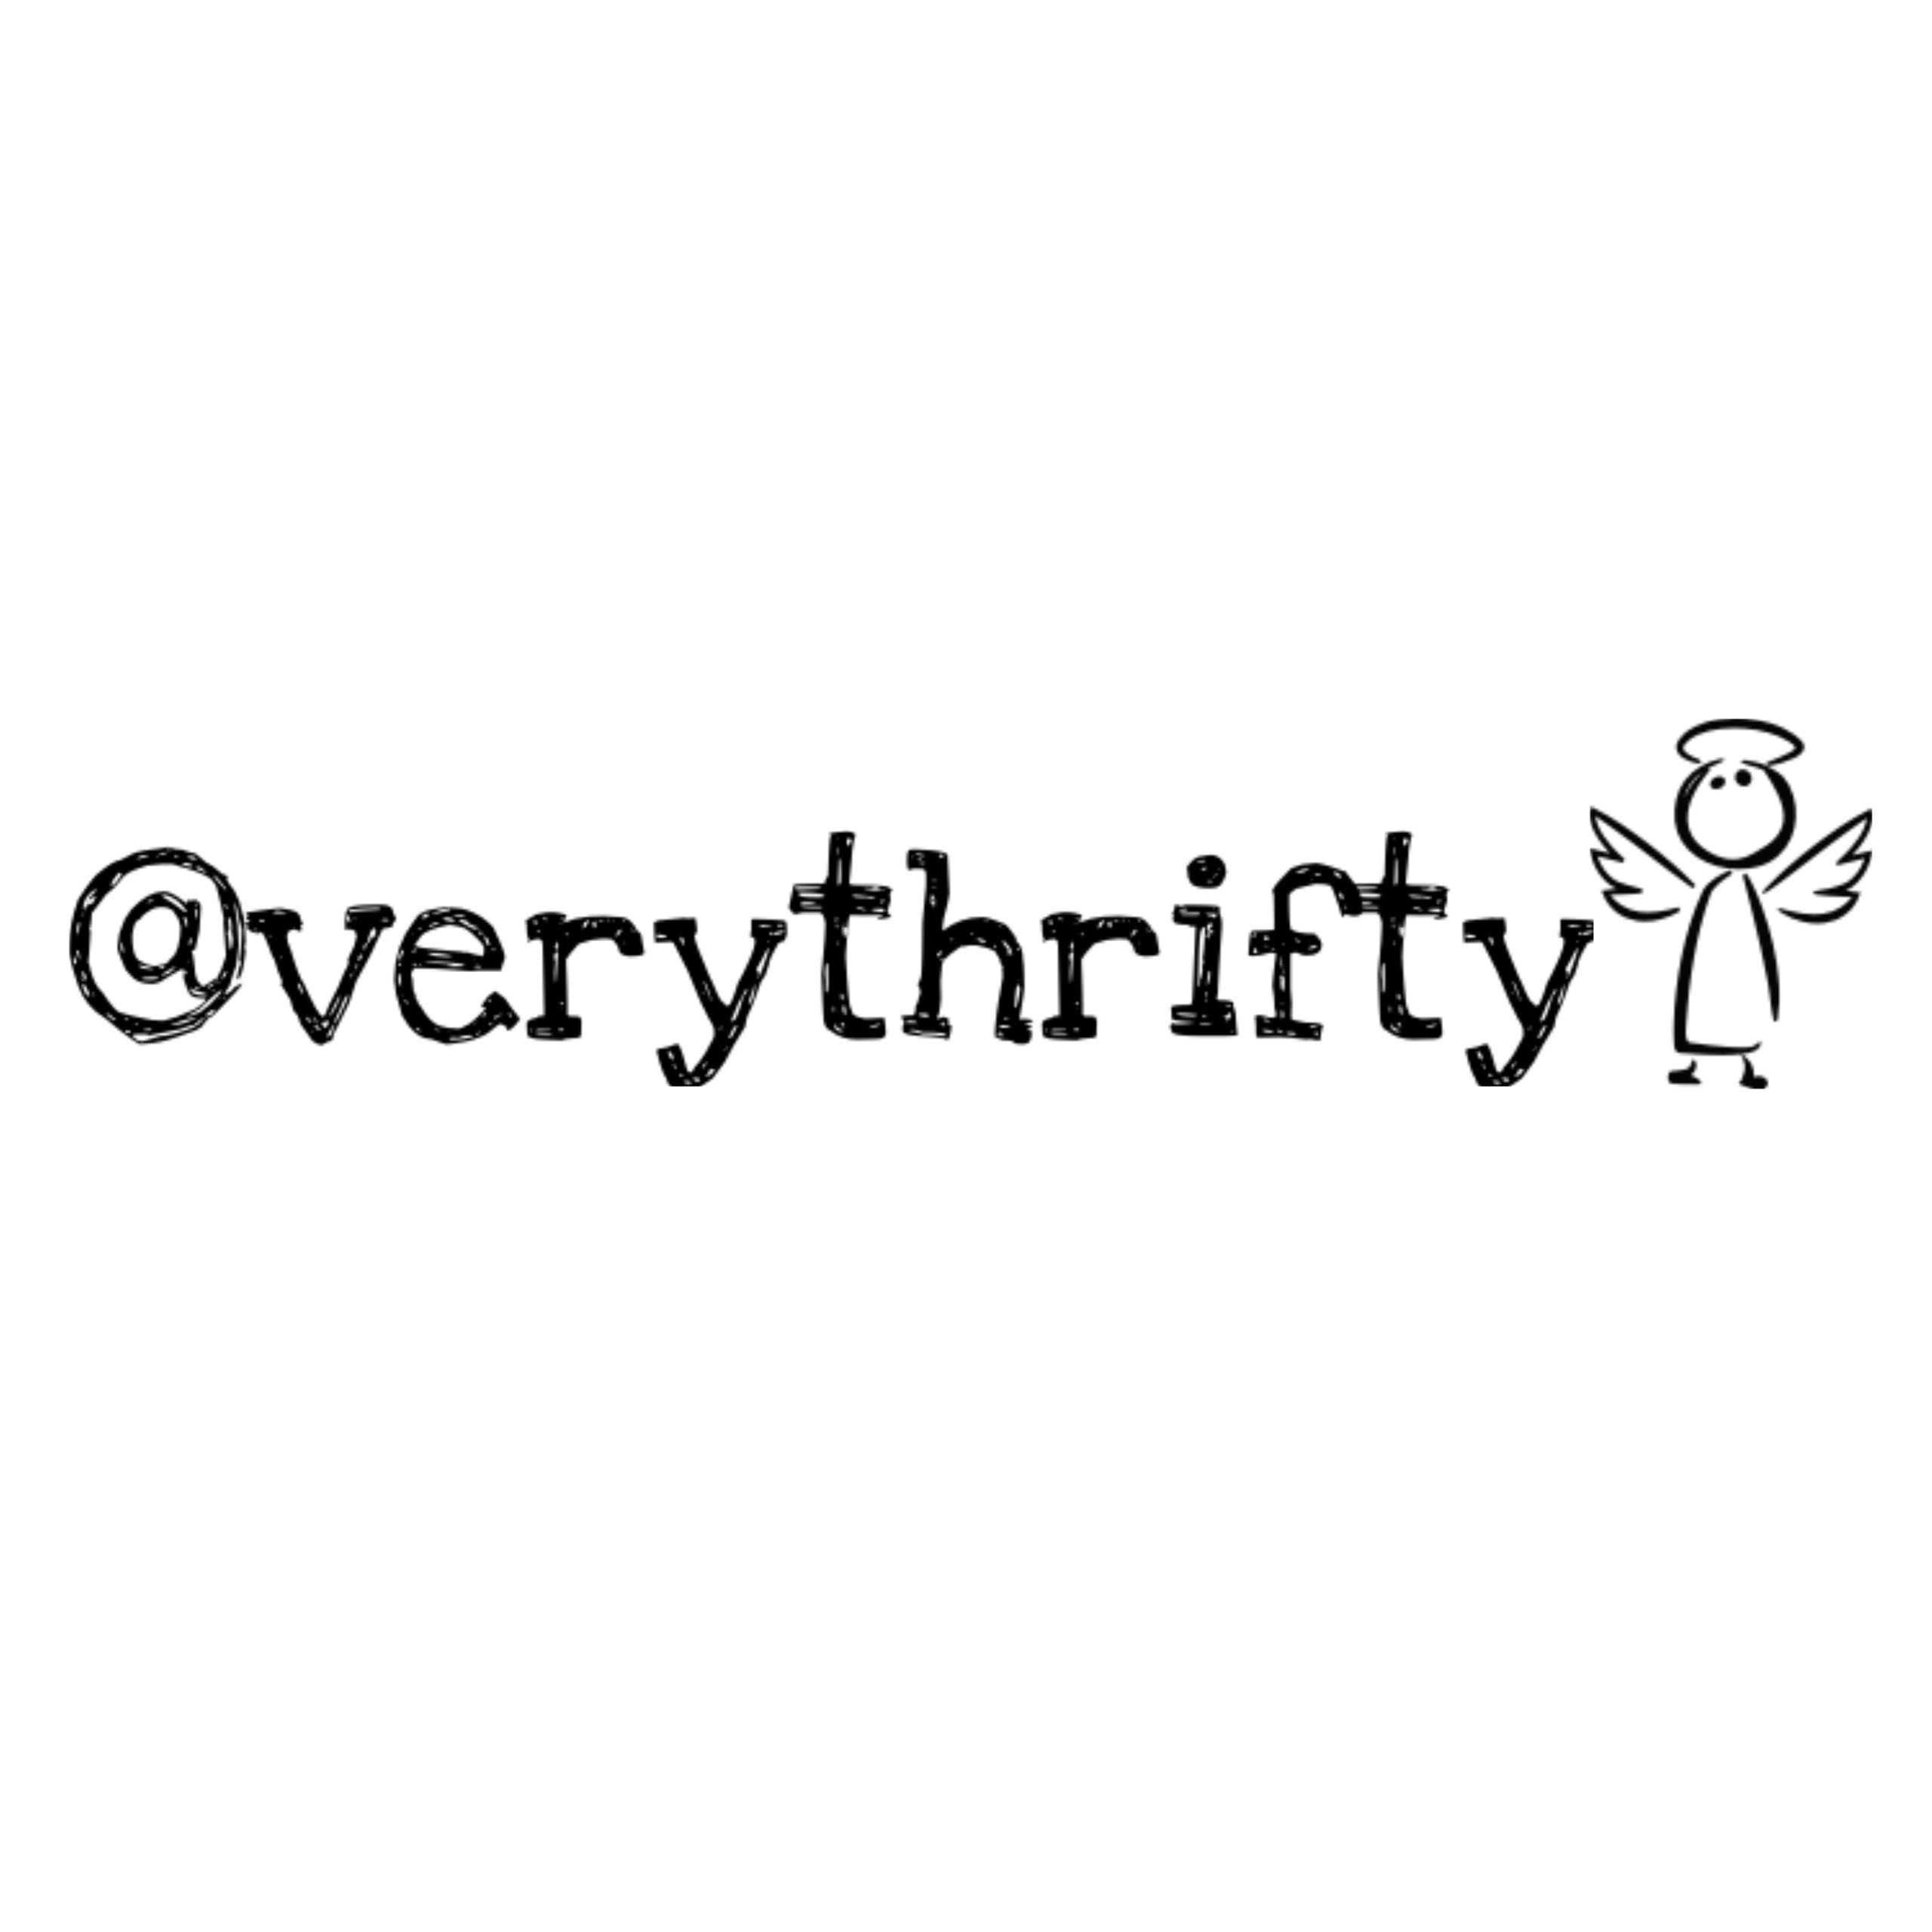 verythrifty